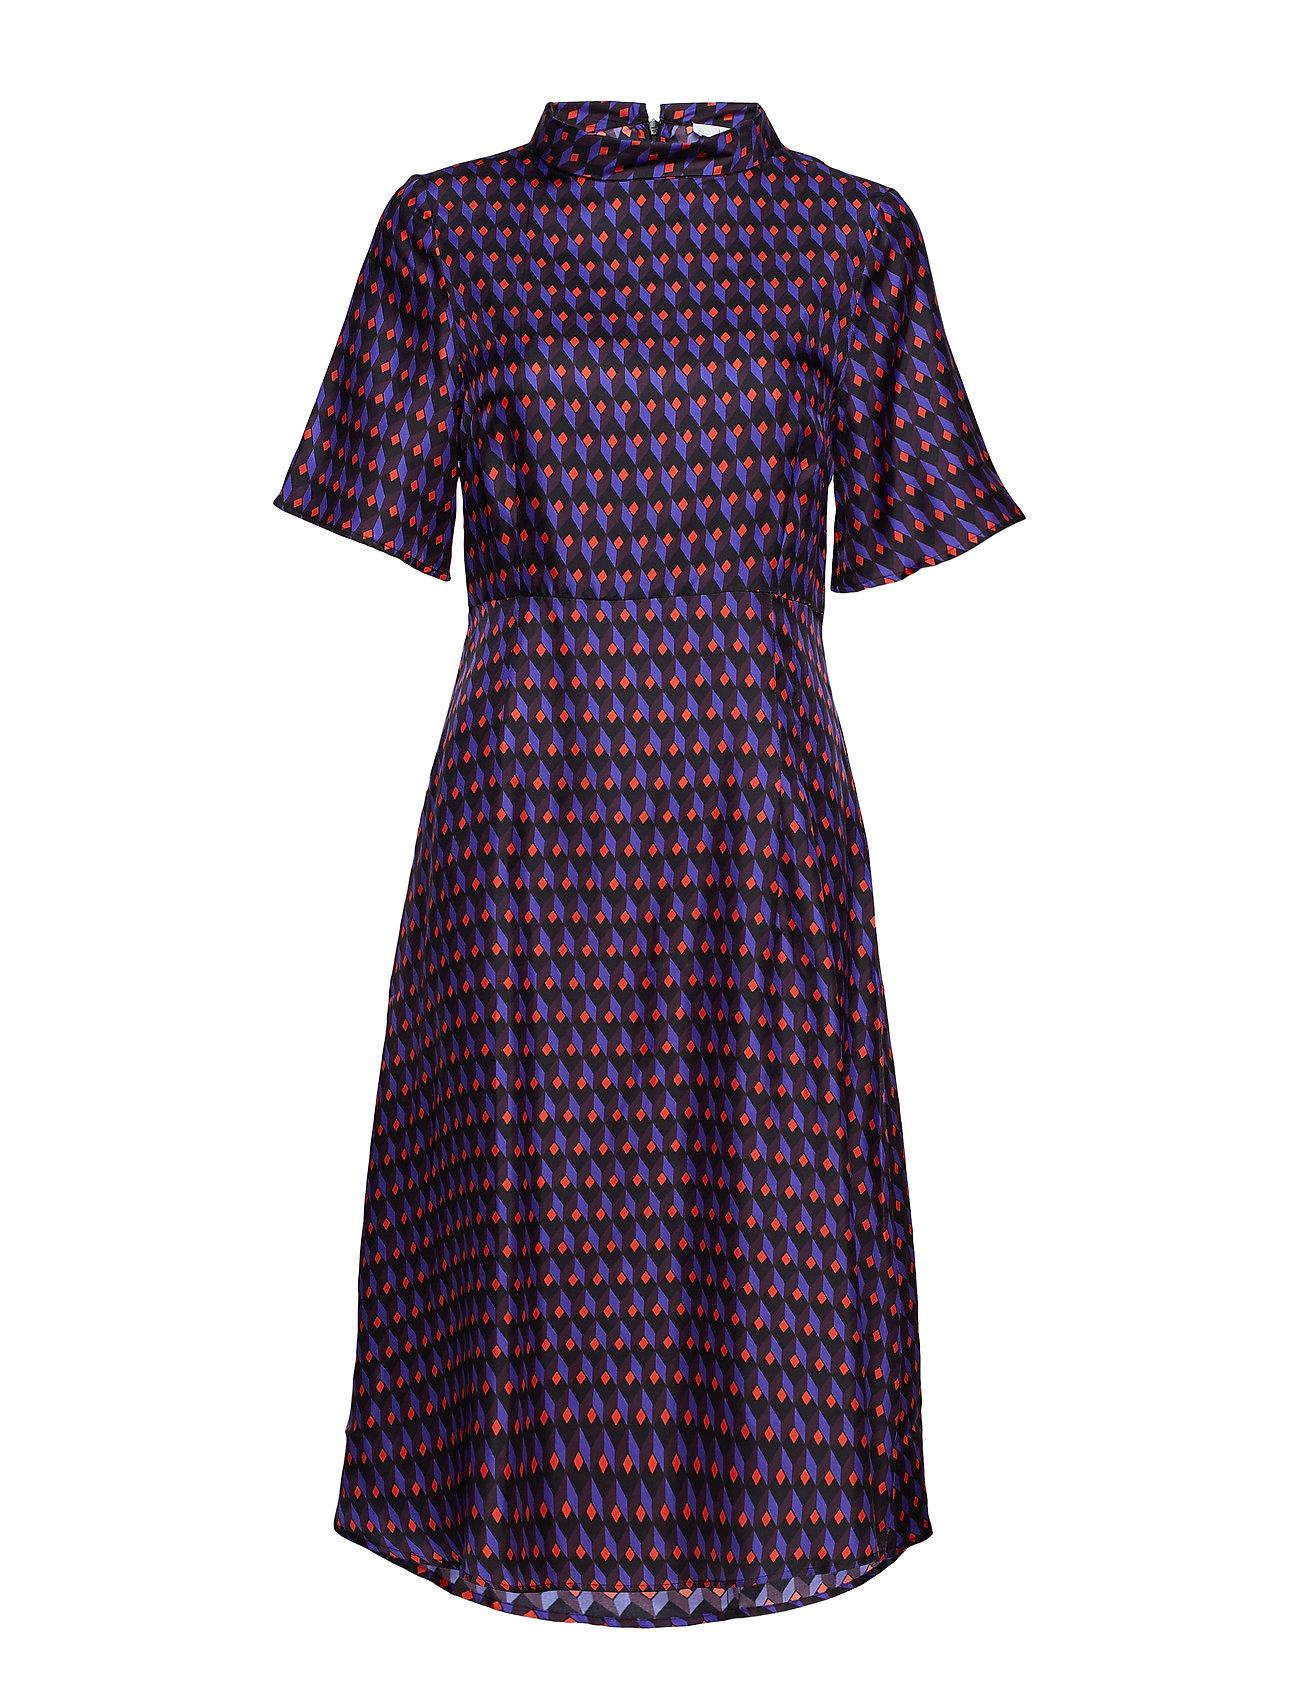 Lovechild 1979 Milo dress - FUDGE